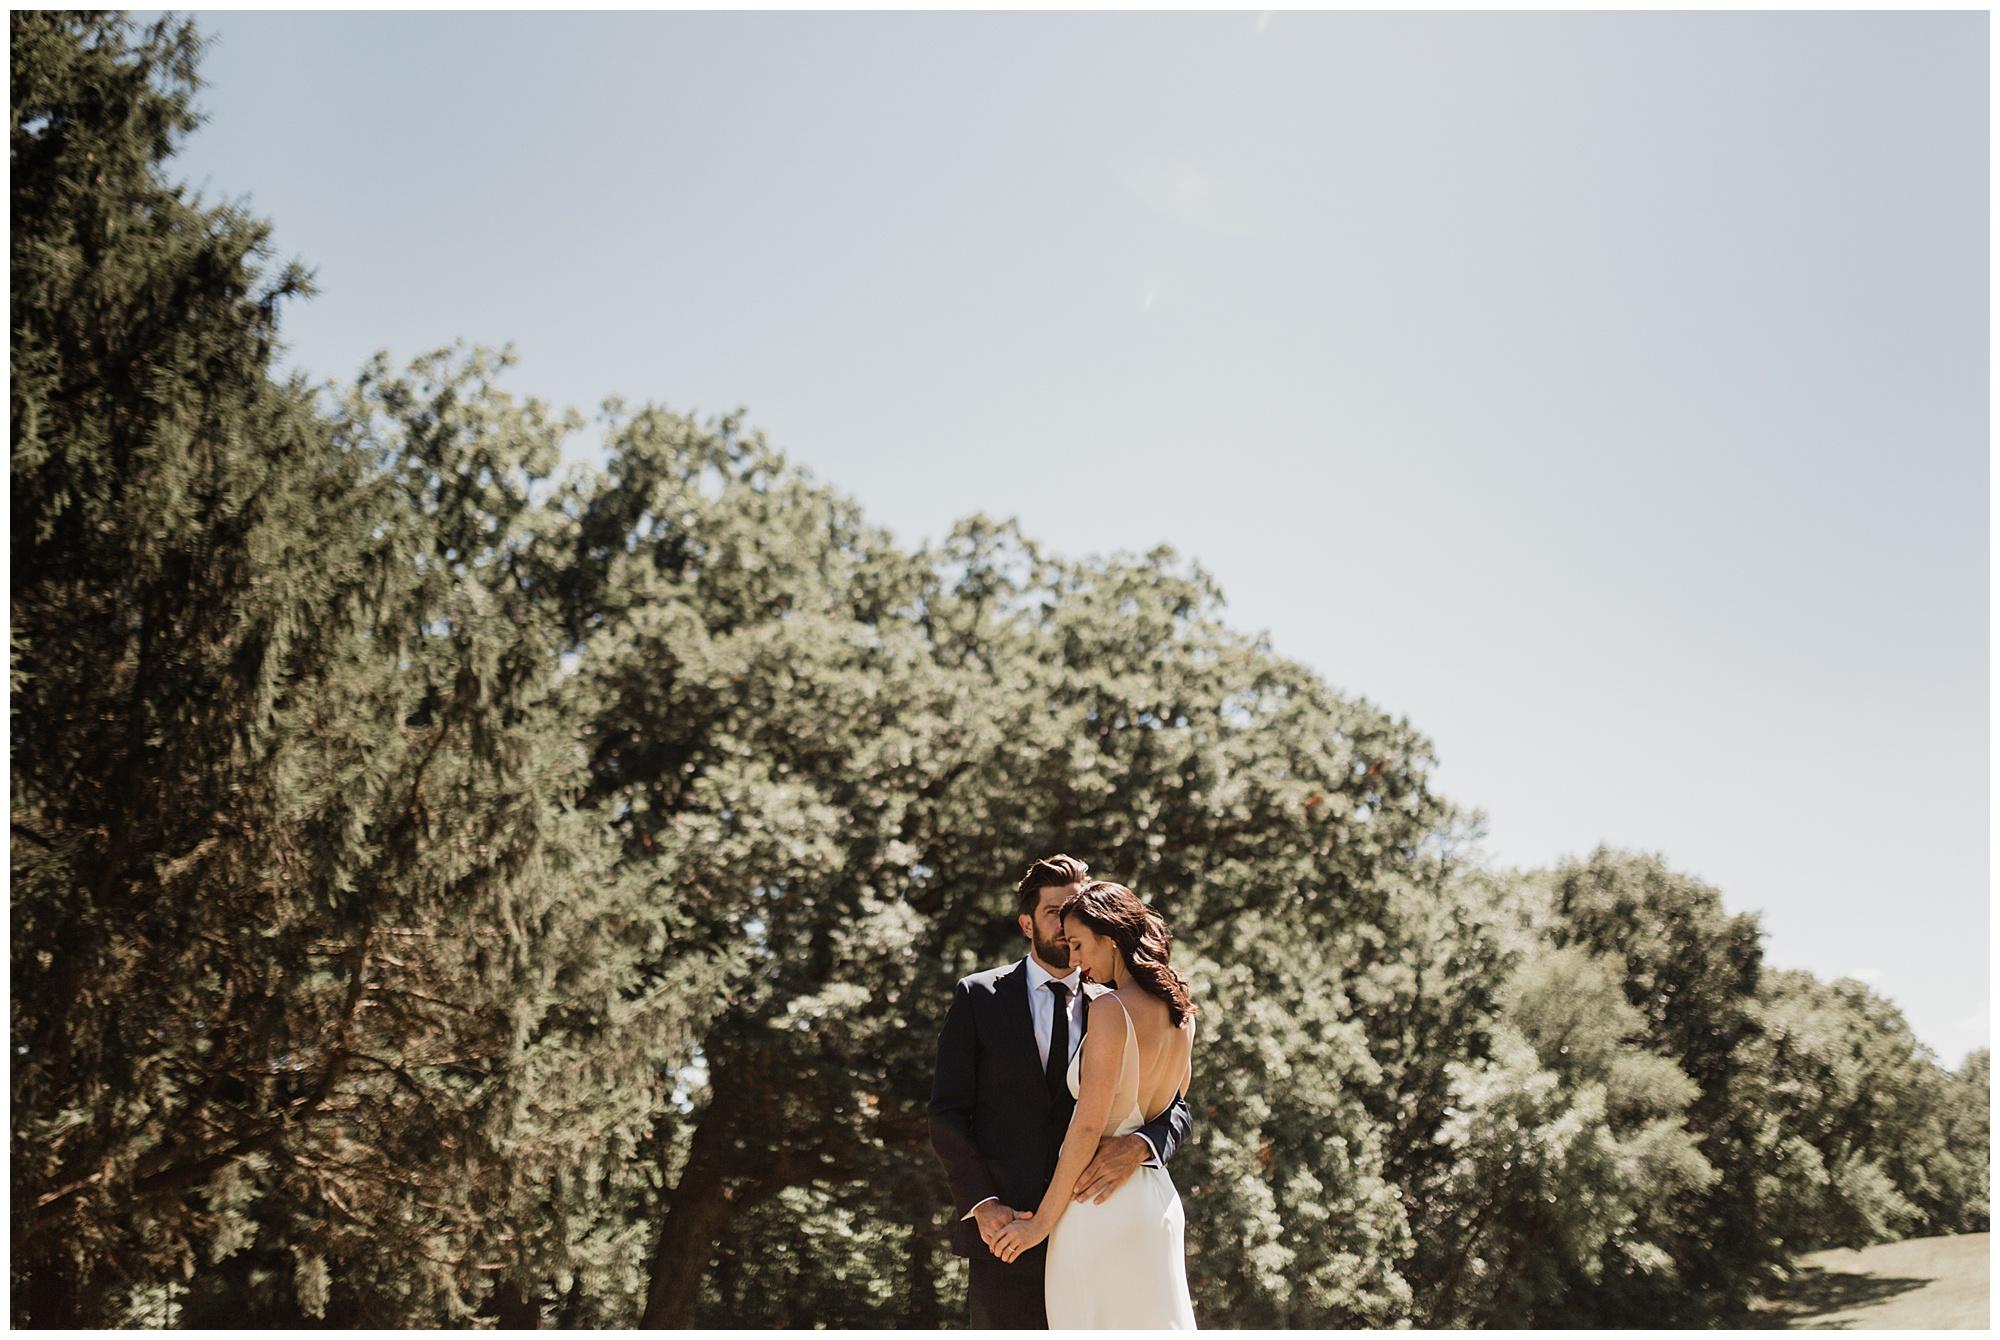 allerton_park_wedding_champaign_il_chicago_wright_photographs_ne_0039.jpg